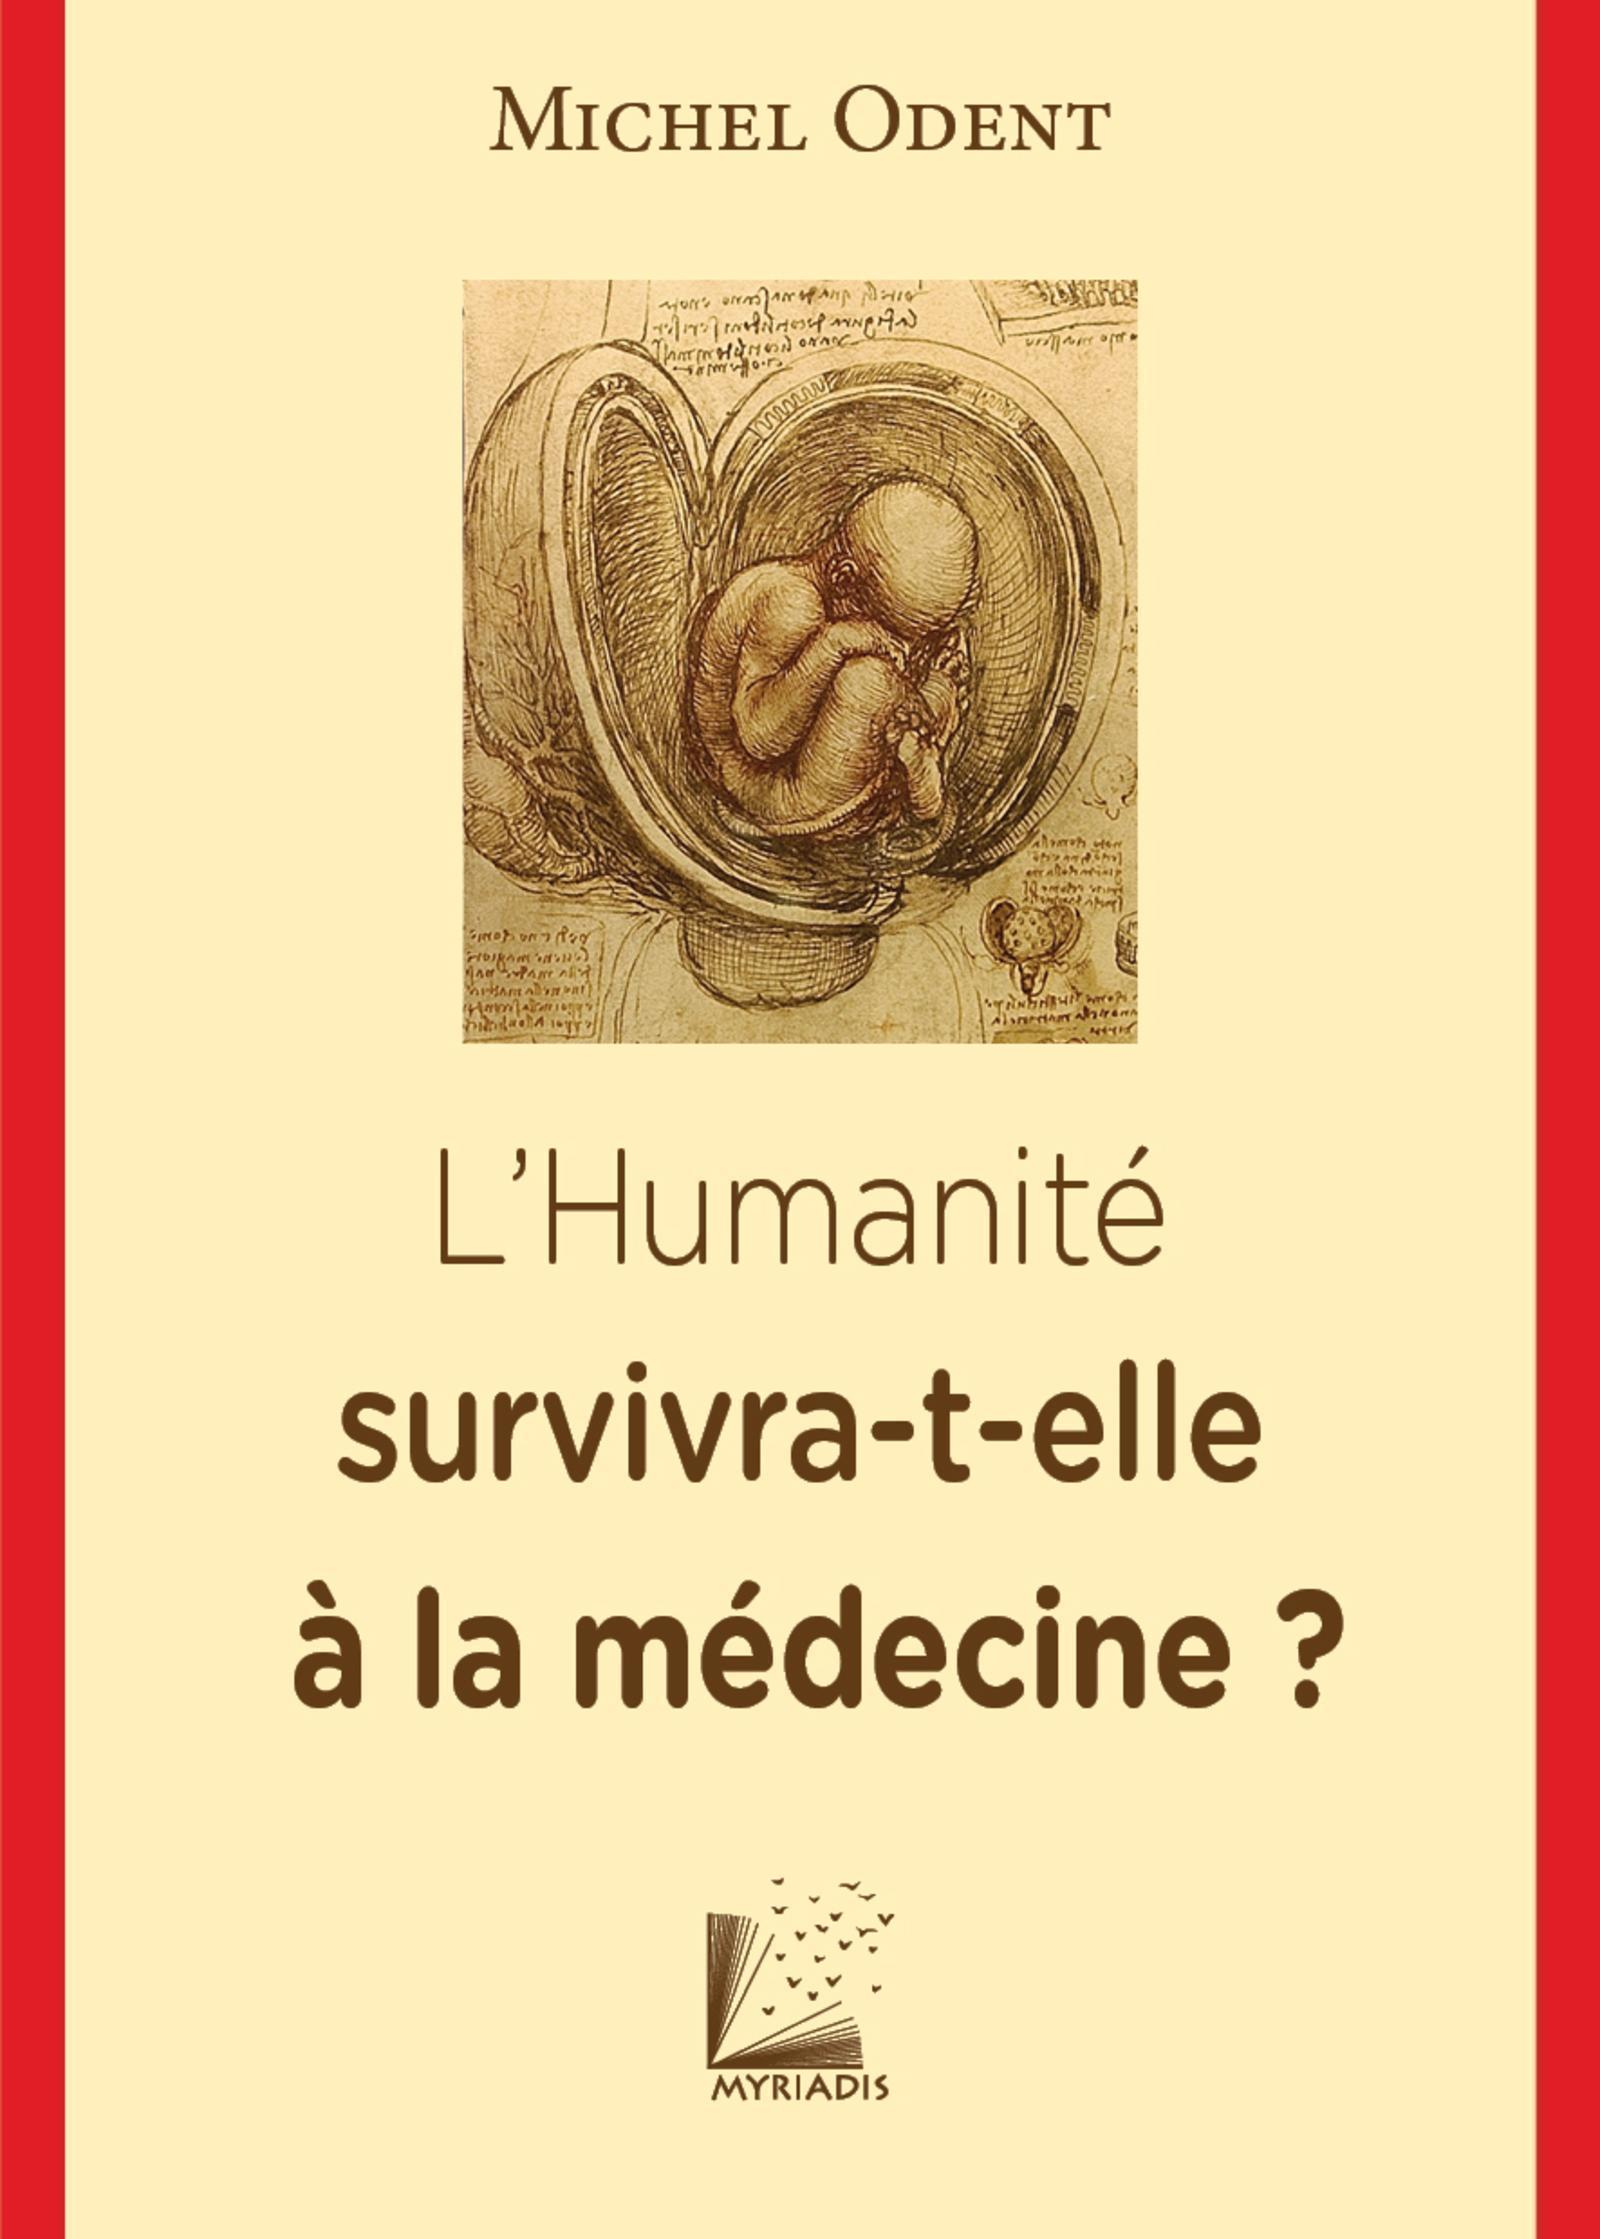 L HUMANITE SURVIVRA T ELLE A LA MEDECINE